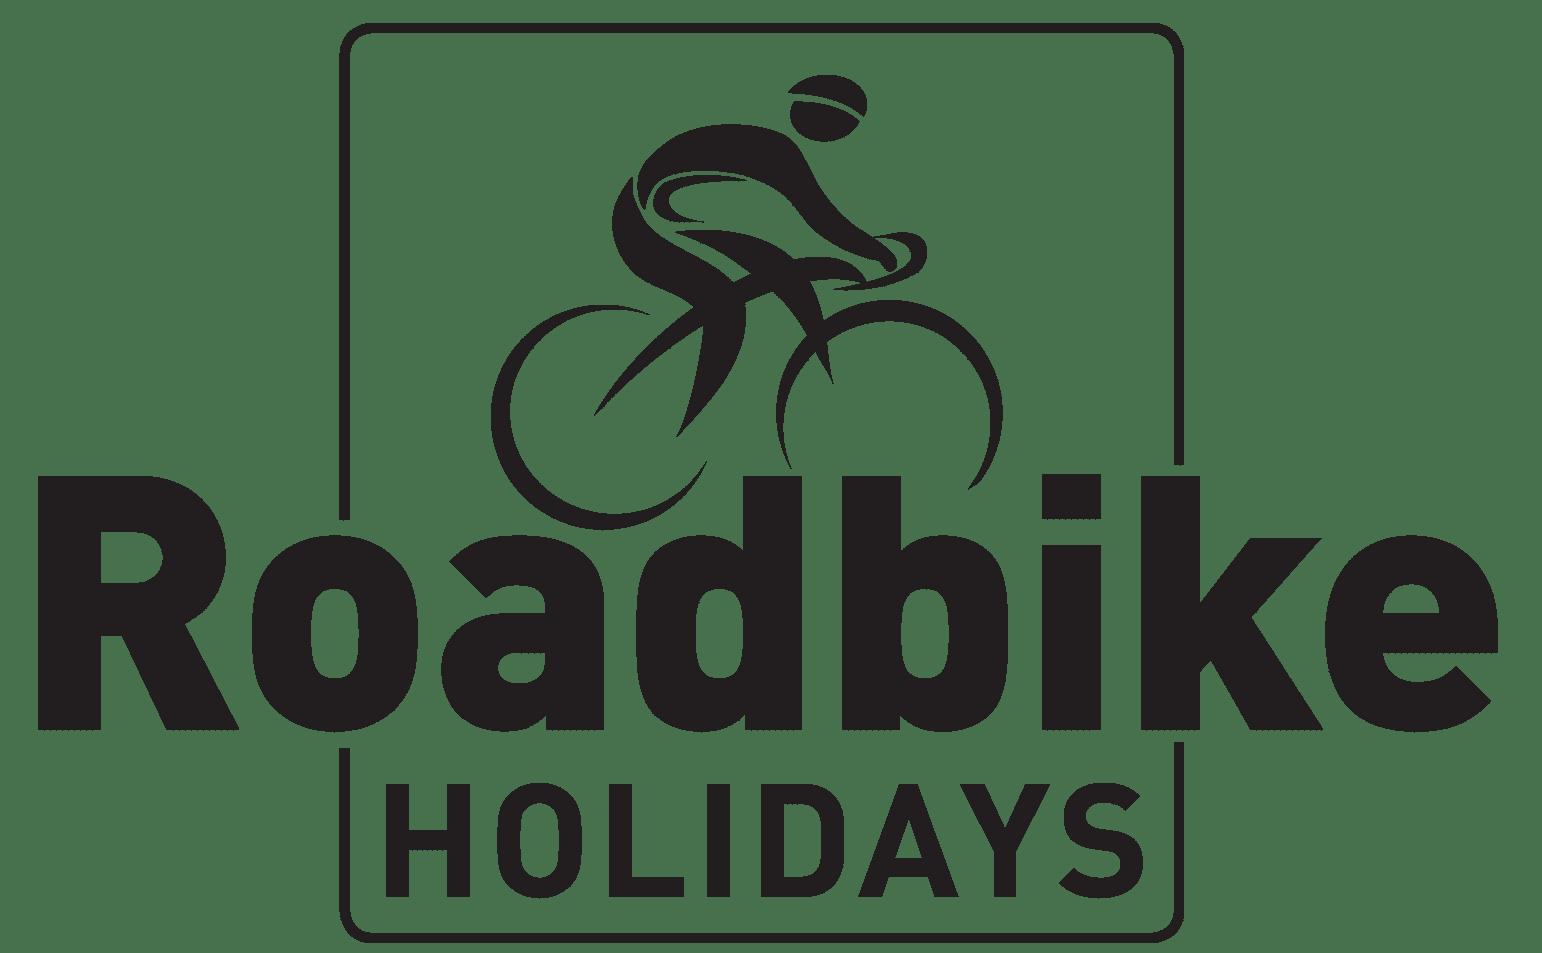 Roadbike Holidays Logo